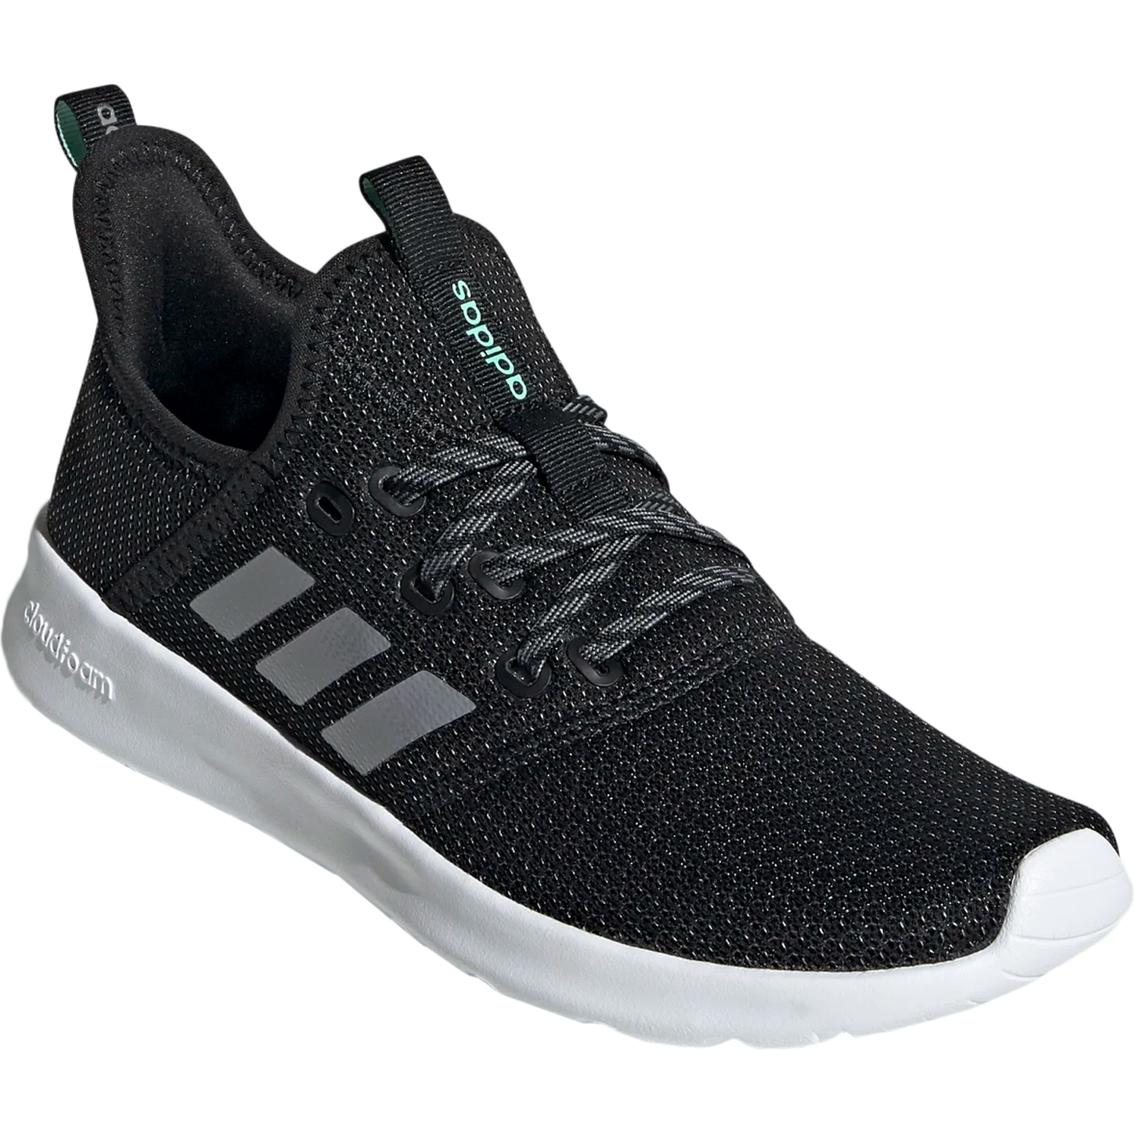 Adidas Womens Cloudfoam Pure Running Shoes | Running | Shoes ...